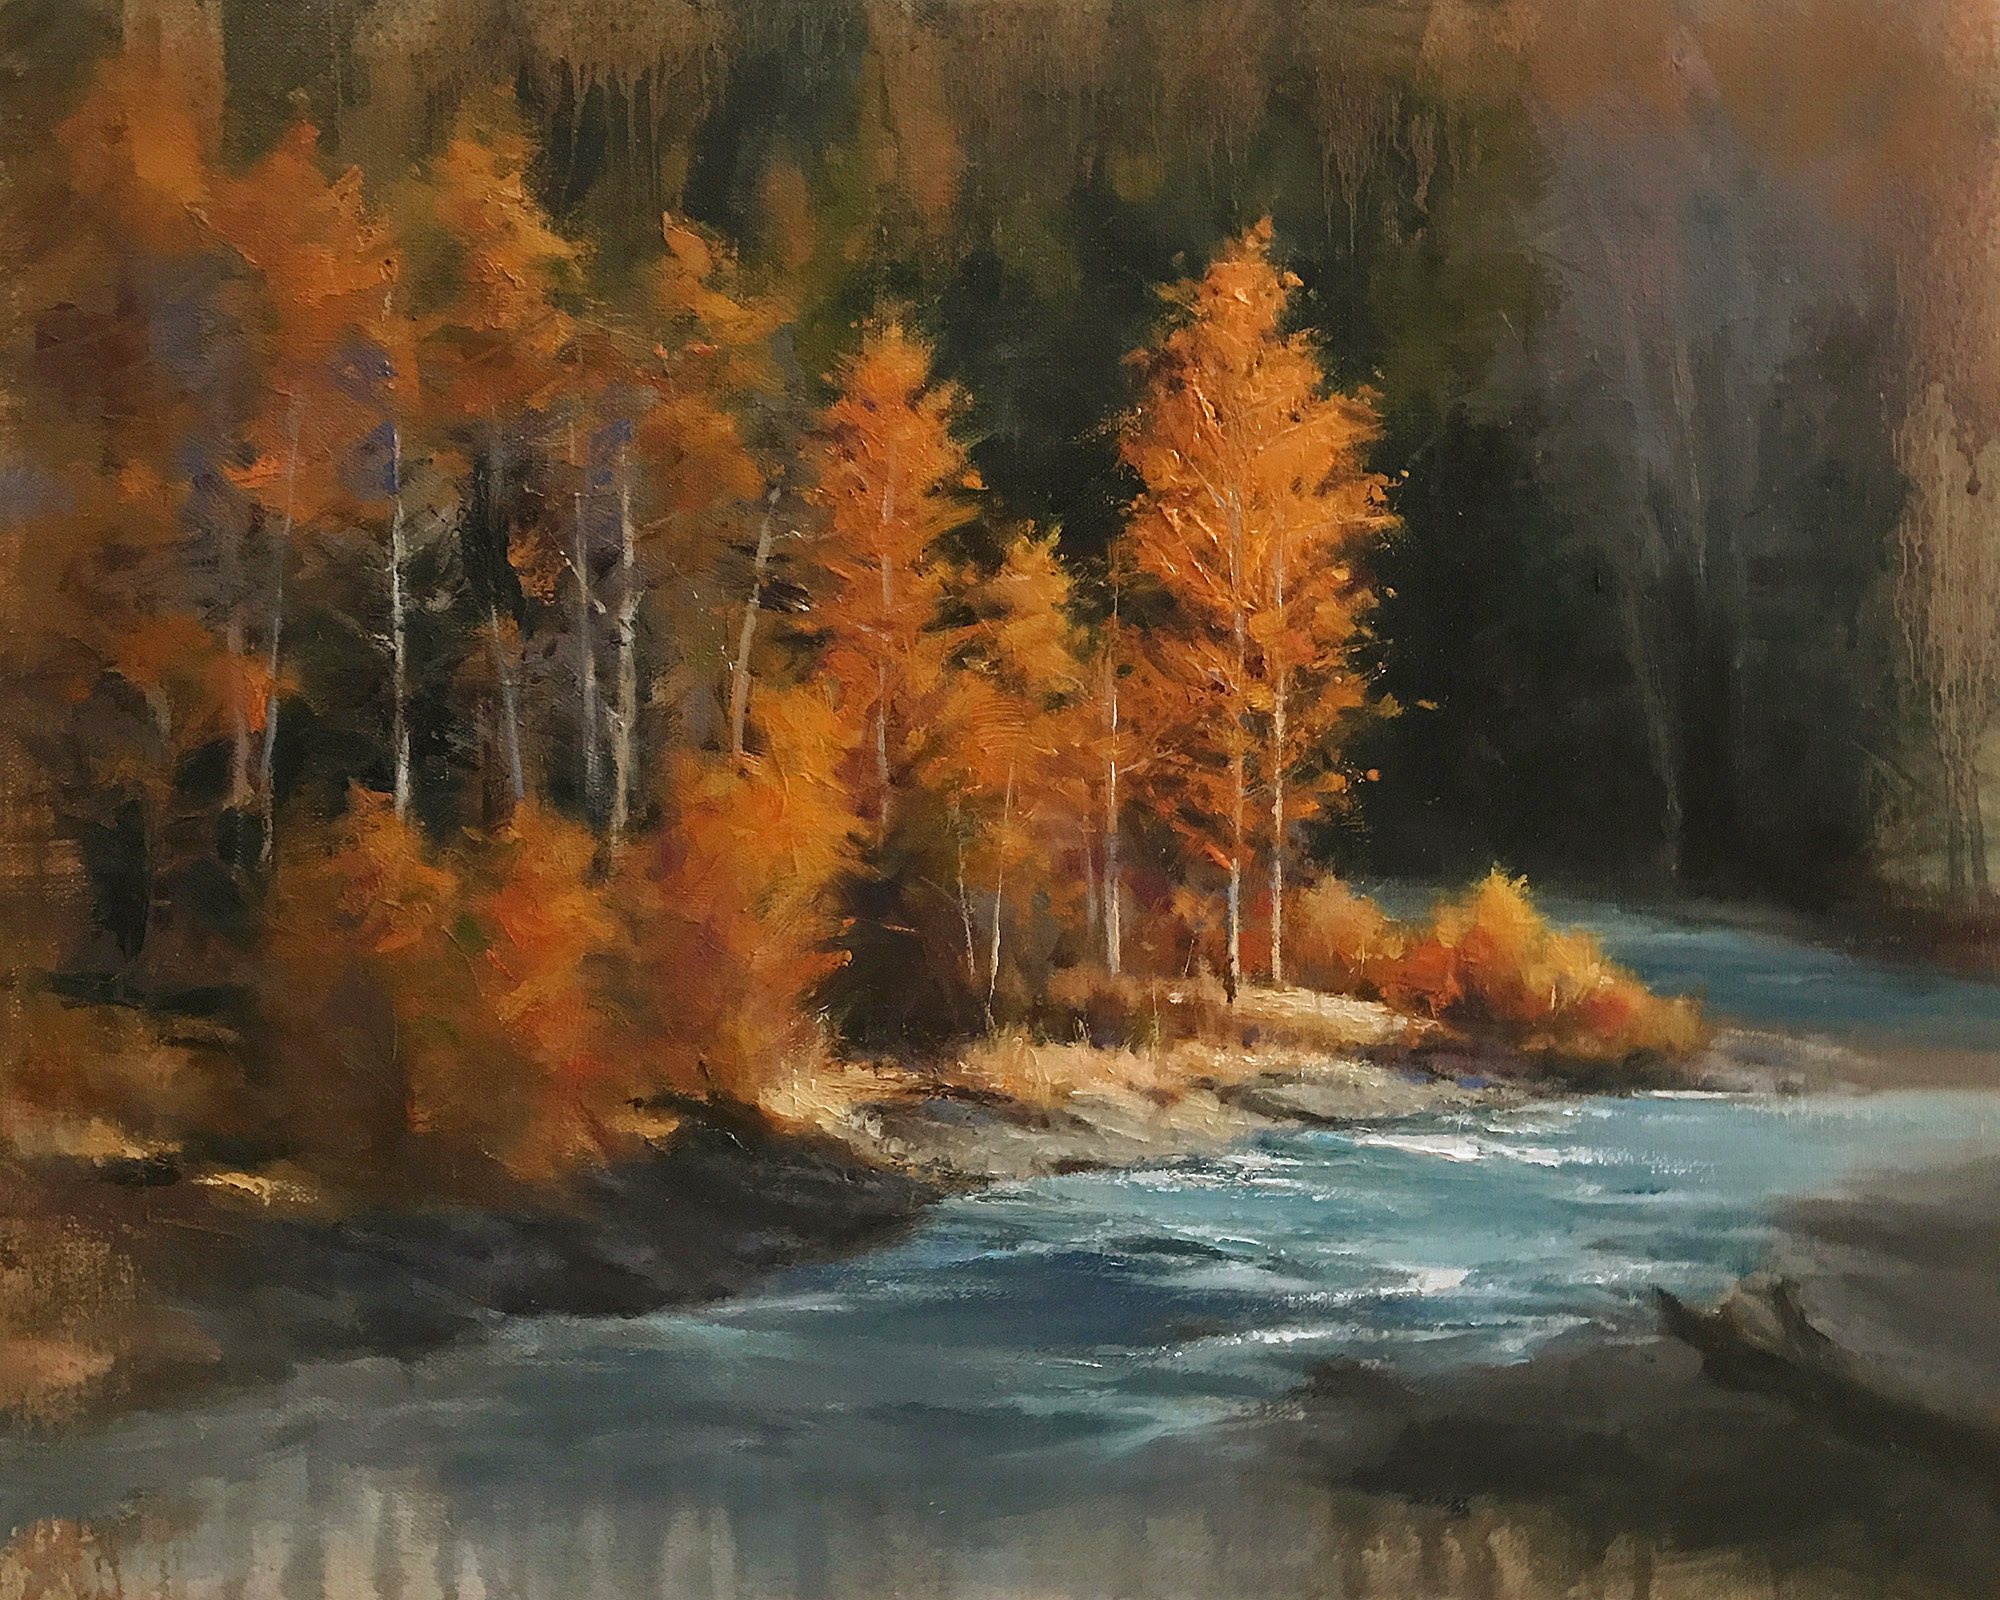 Autumn Gold_16x20 (22x26)_$2150.jpg